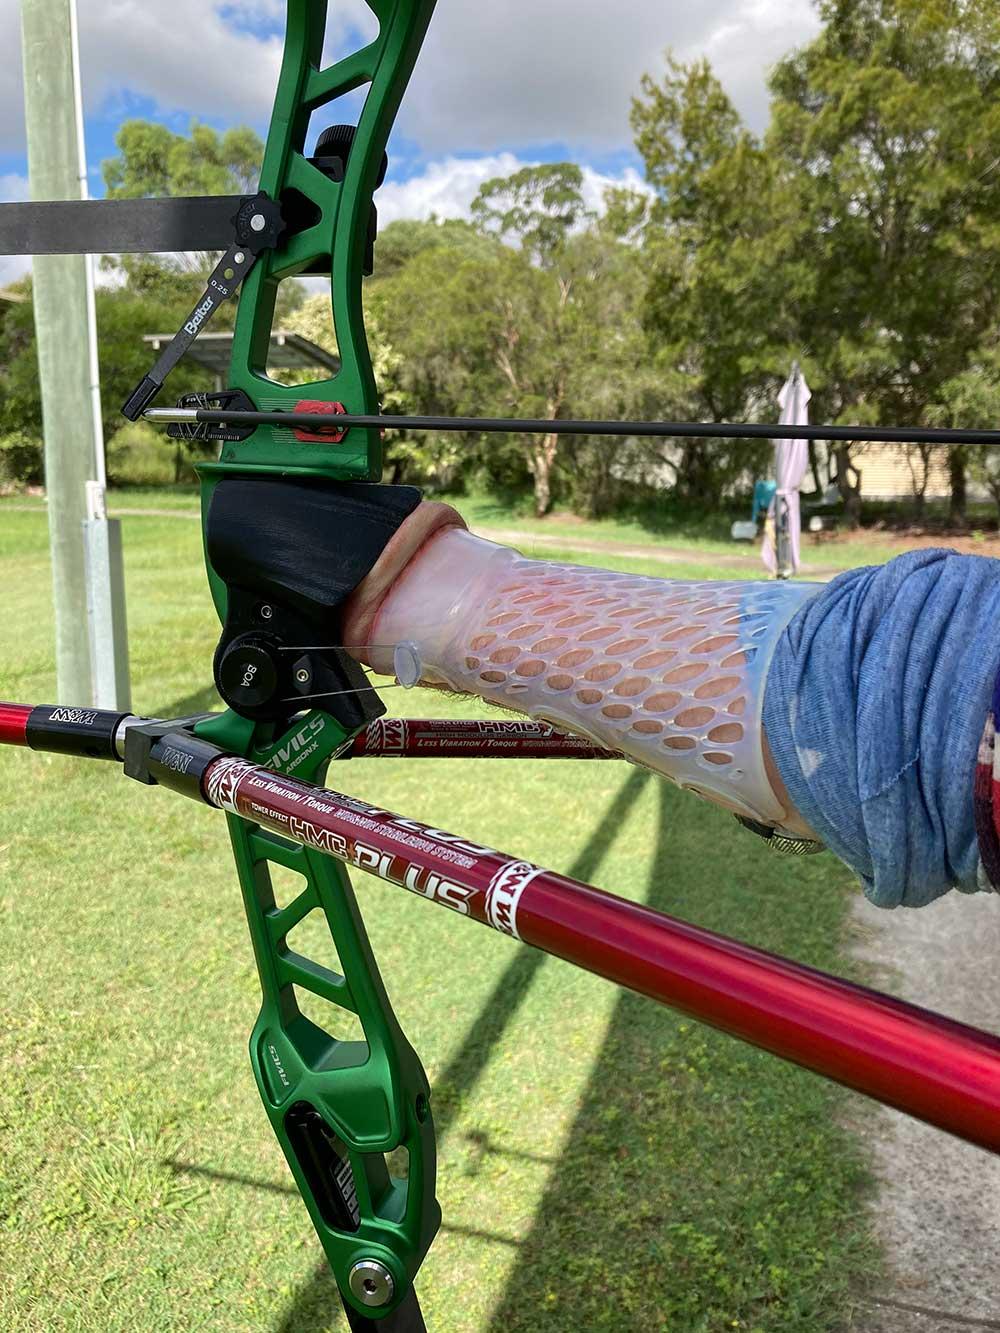 Paralympic athlete Taymon Kenton-Smith's arm brace and grip